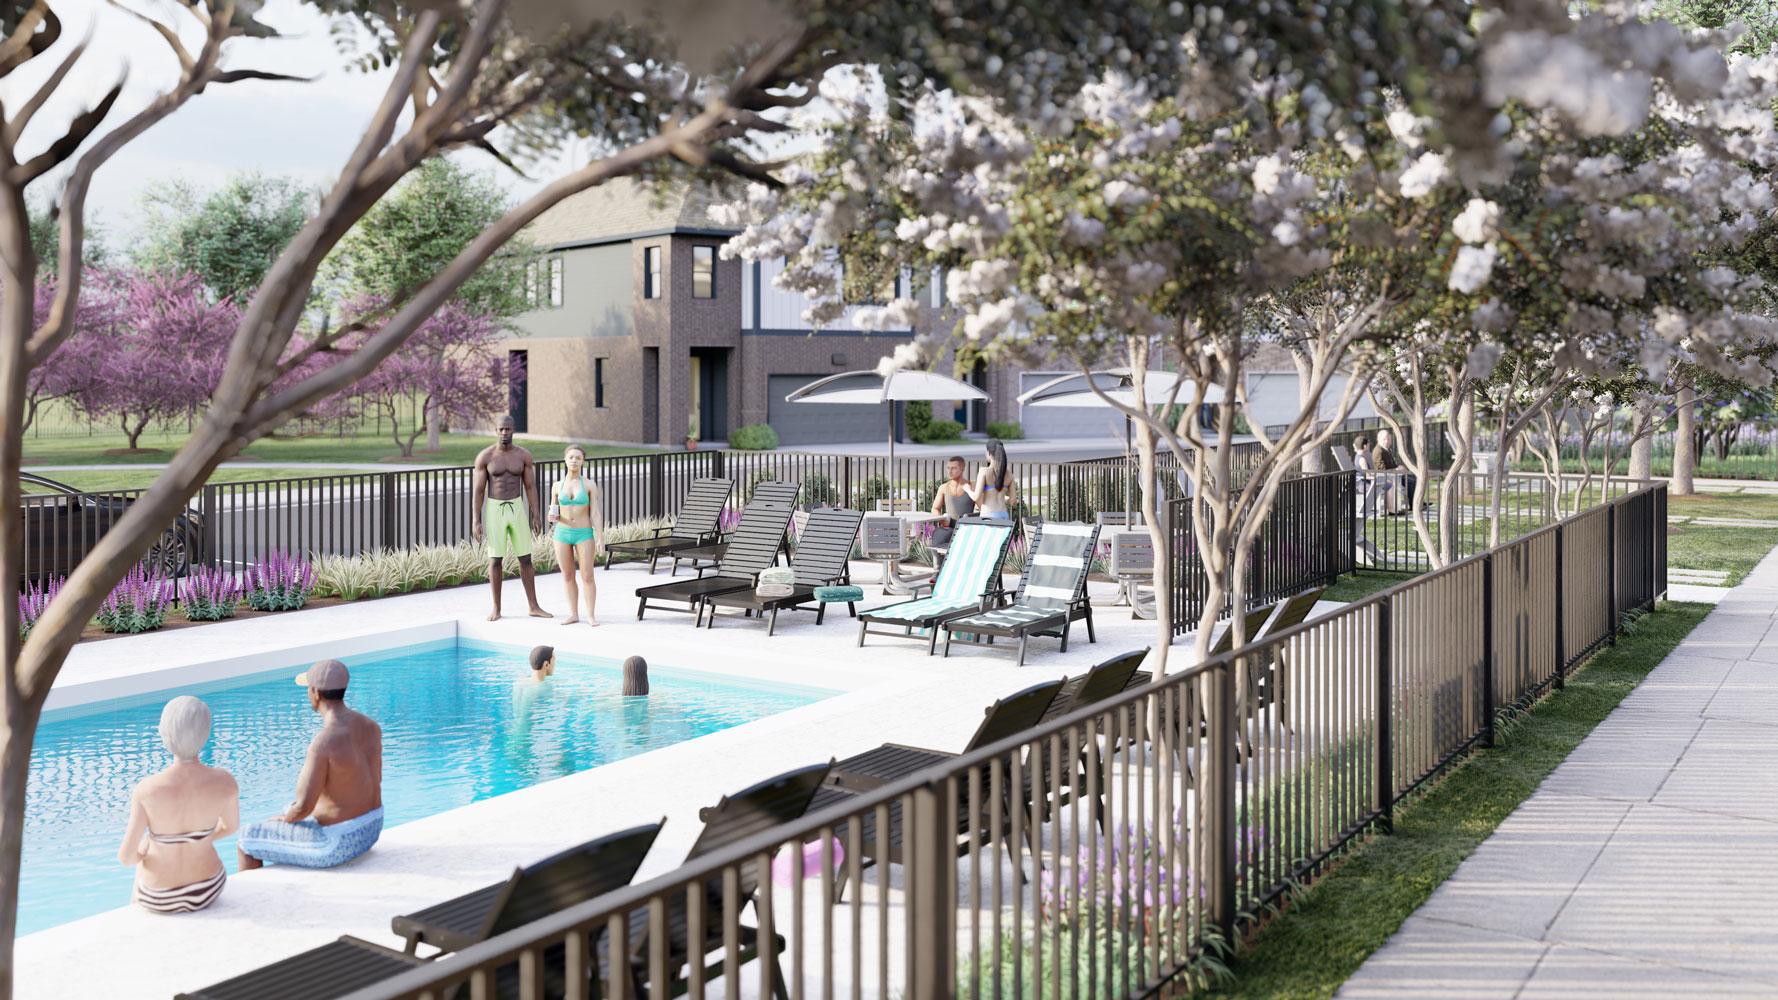 Resort-Style Pool at Echelon at Reverchon Bluffs in Dallas, Texas